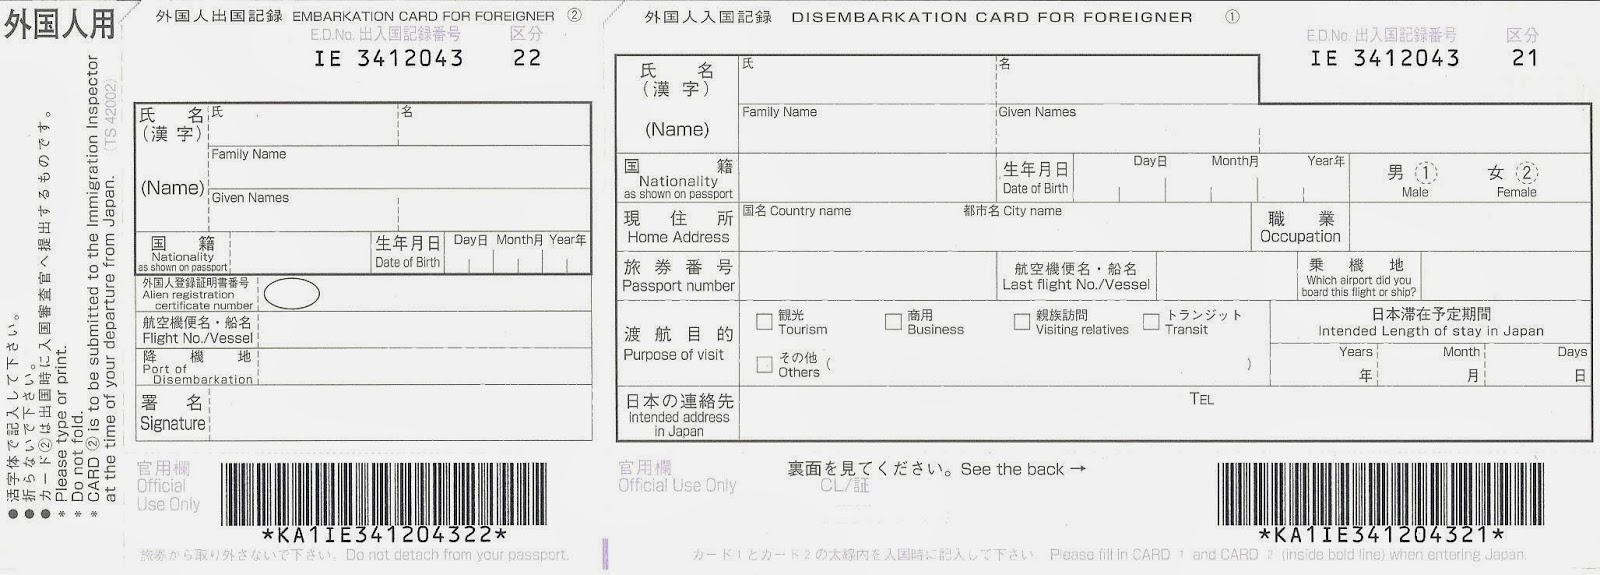 embarcation_card_japan Visa Application Form For Enter Japan on japan tourist, japan visa stamp, japan student visa, japan visa to enter, japan immigration, dating application form, example application form, japan visa application fee,